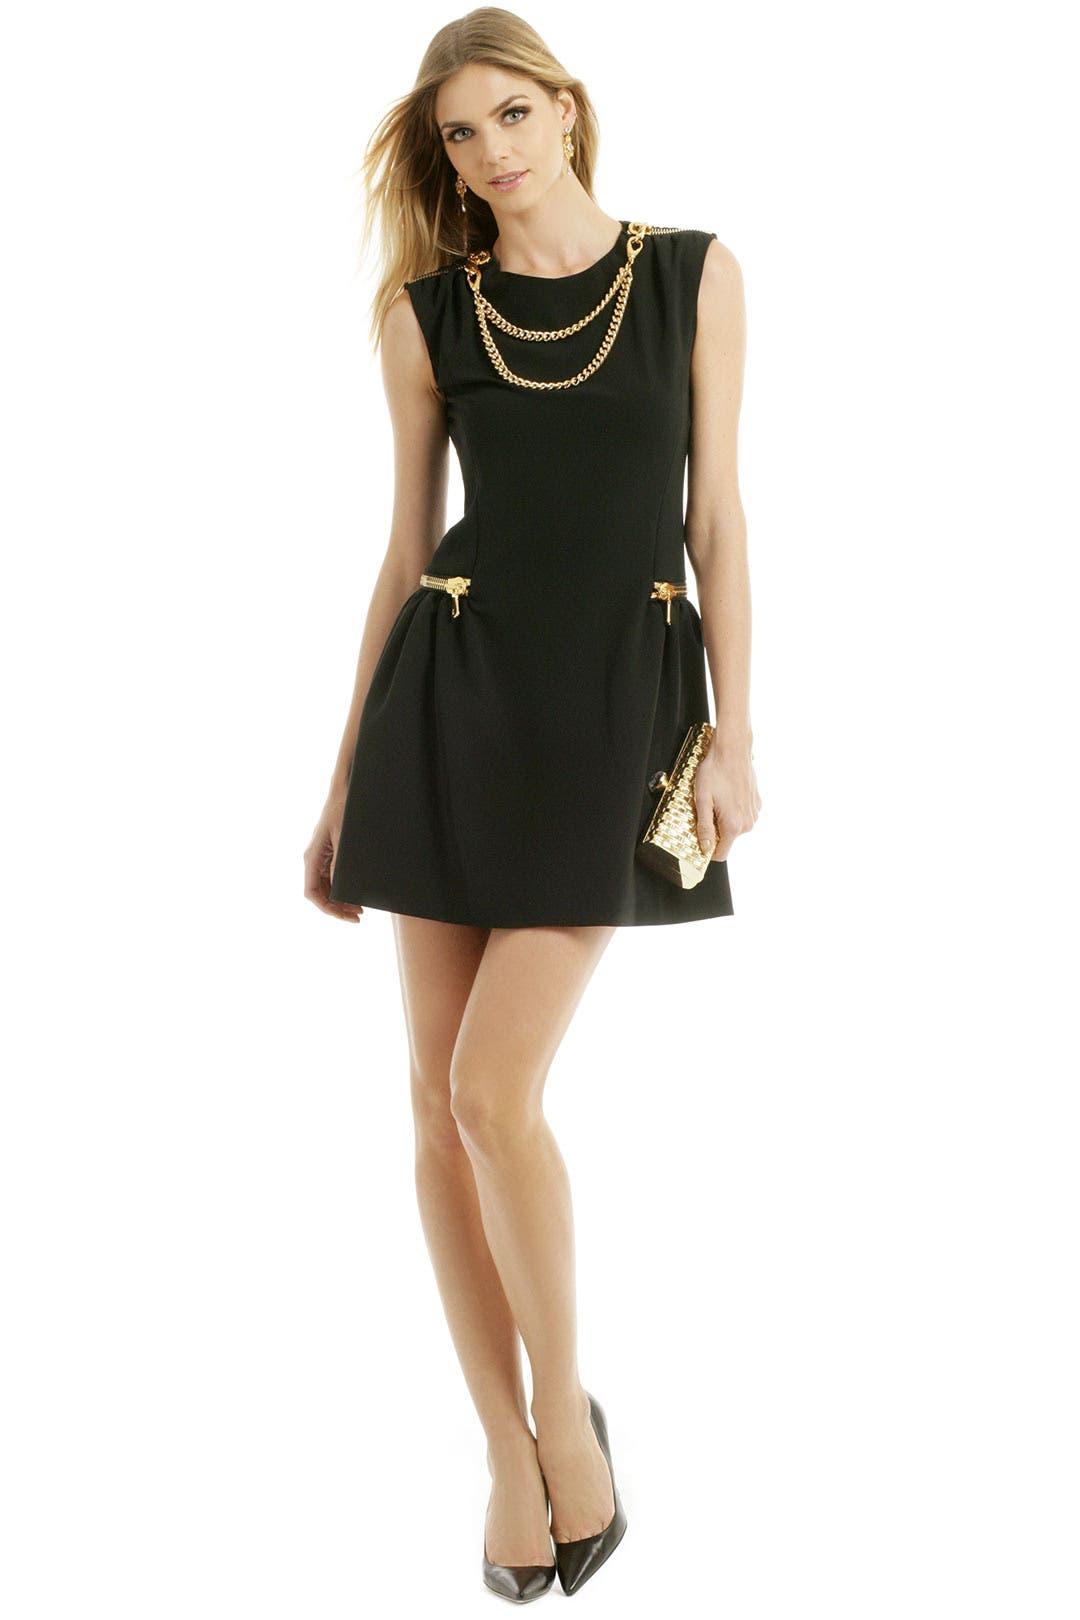 Chain To Zip Dress by Moschino